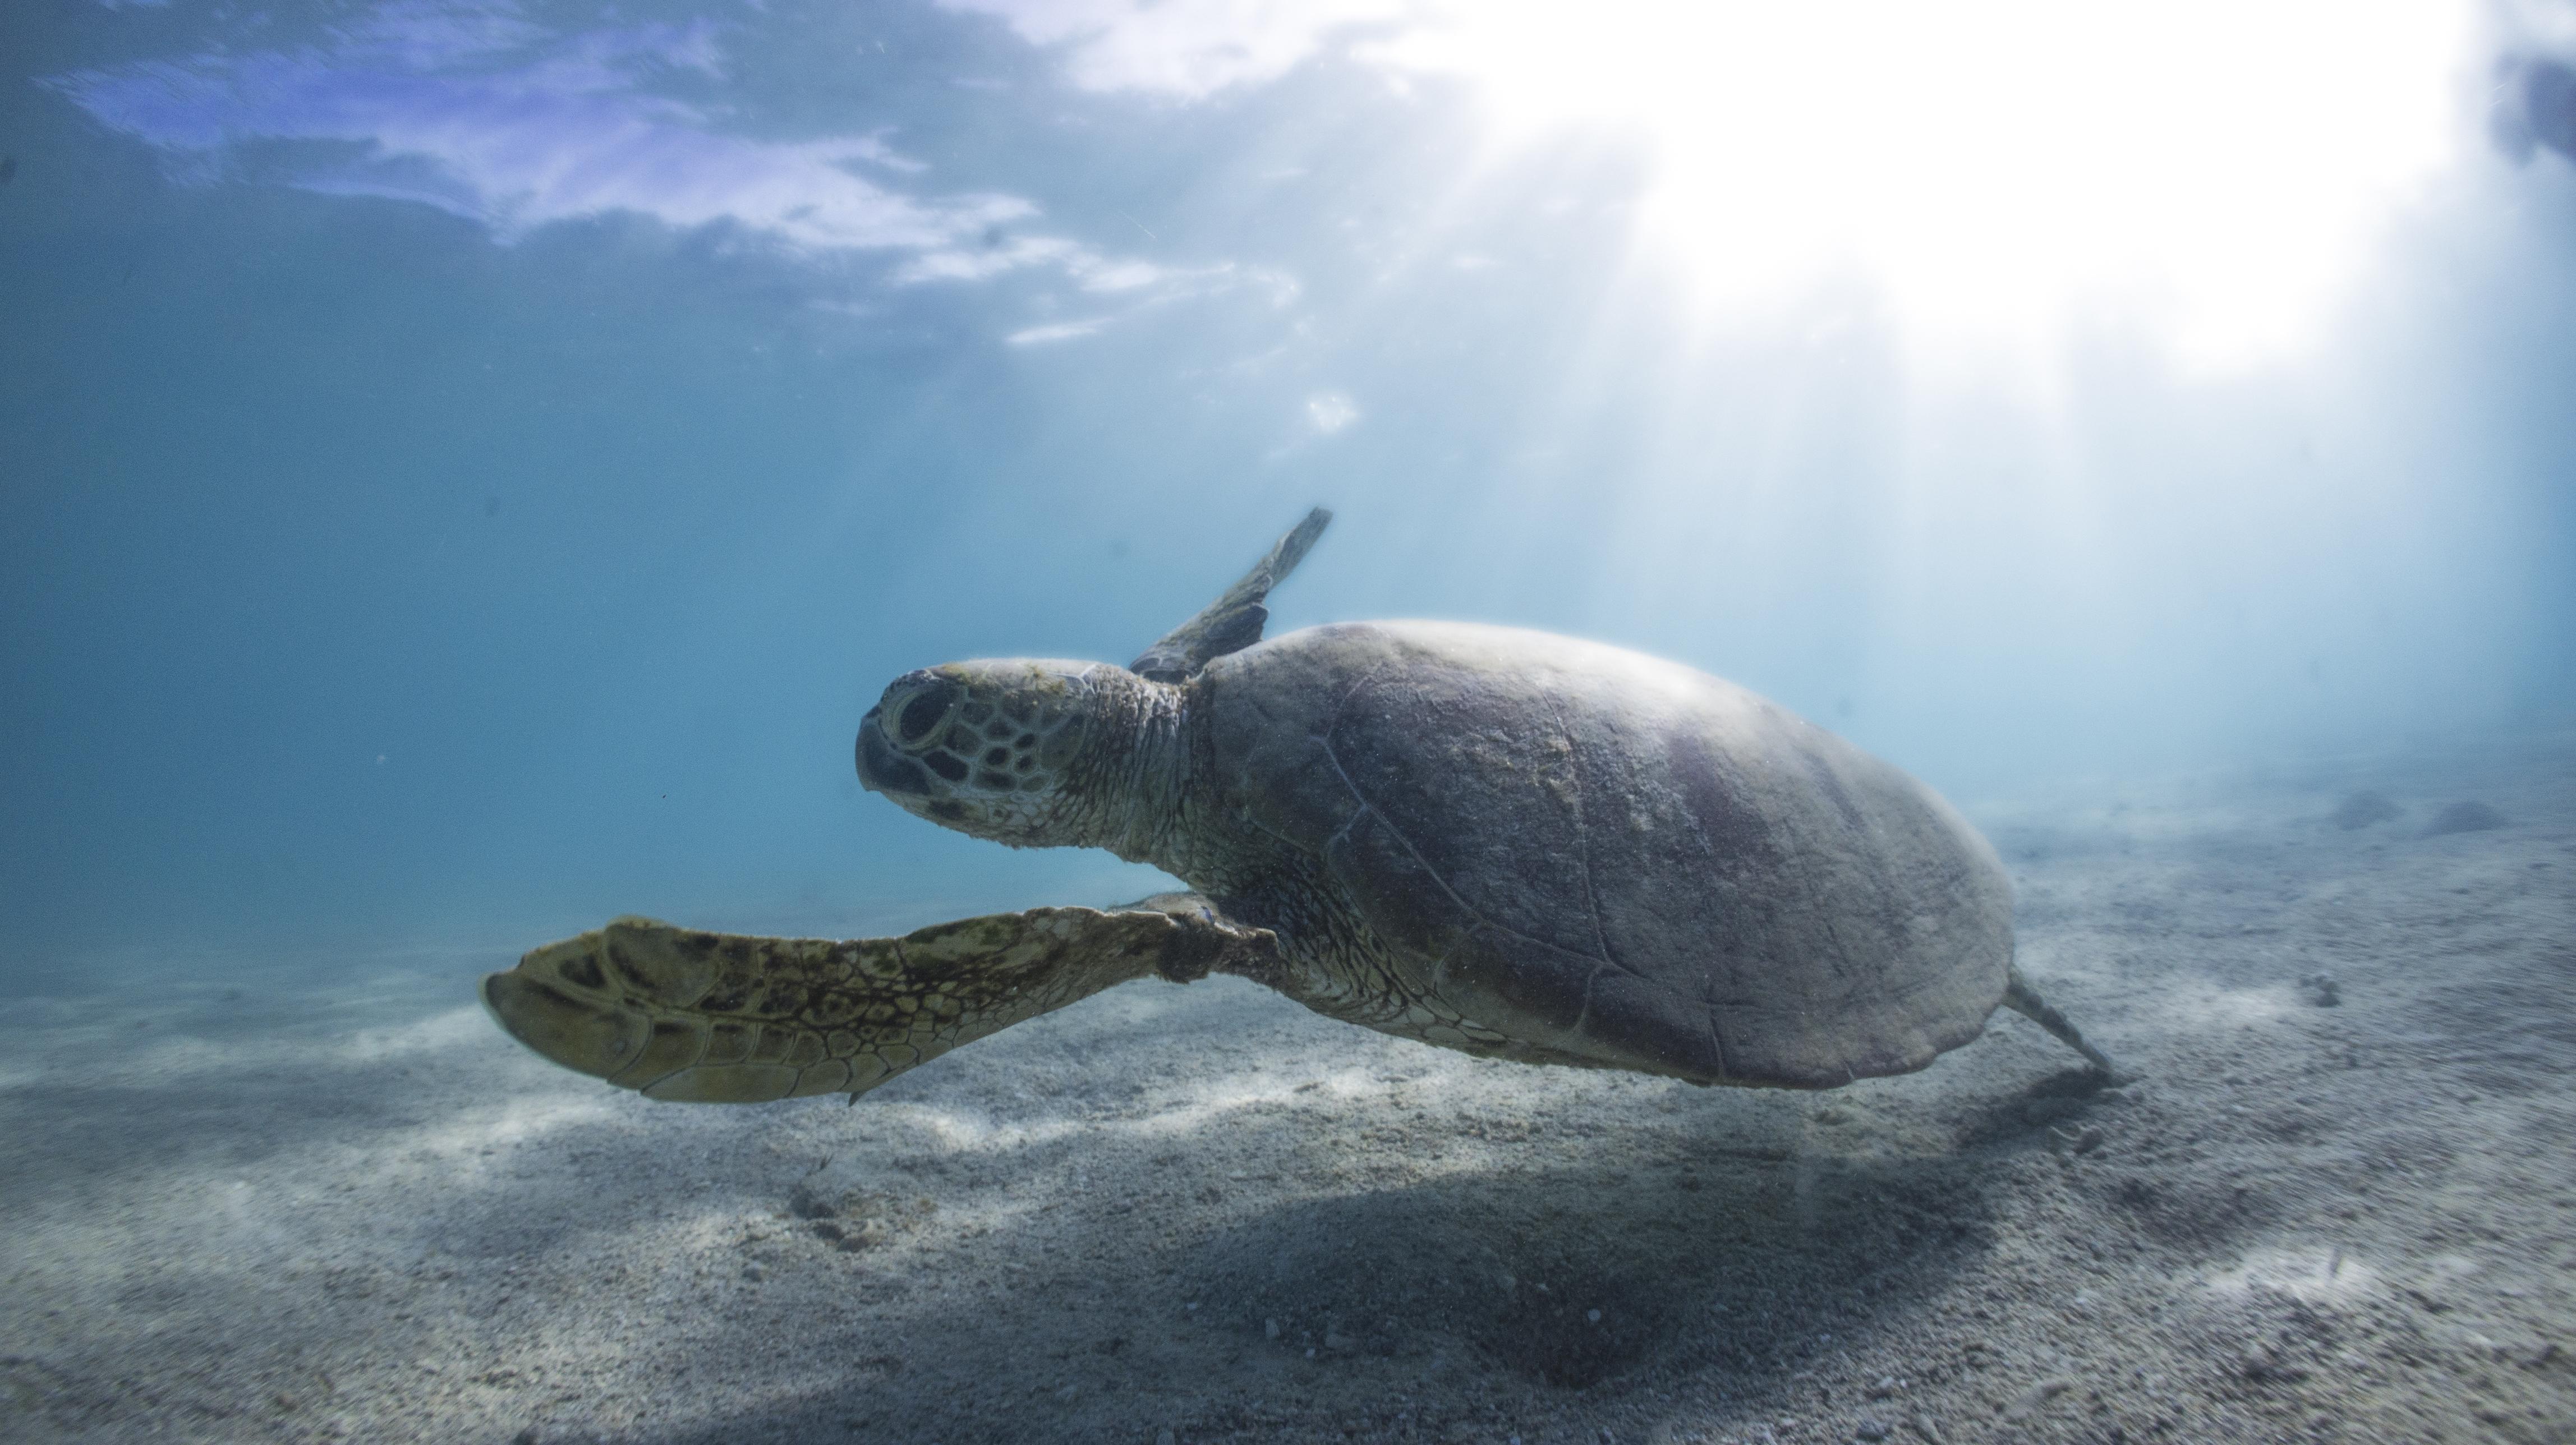 Green sea turtle in the Great Barrier Reef, Australia